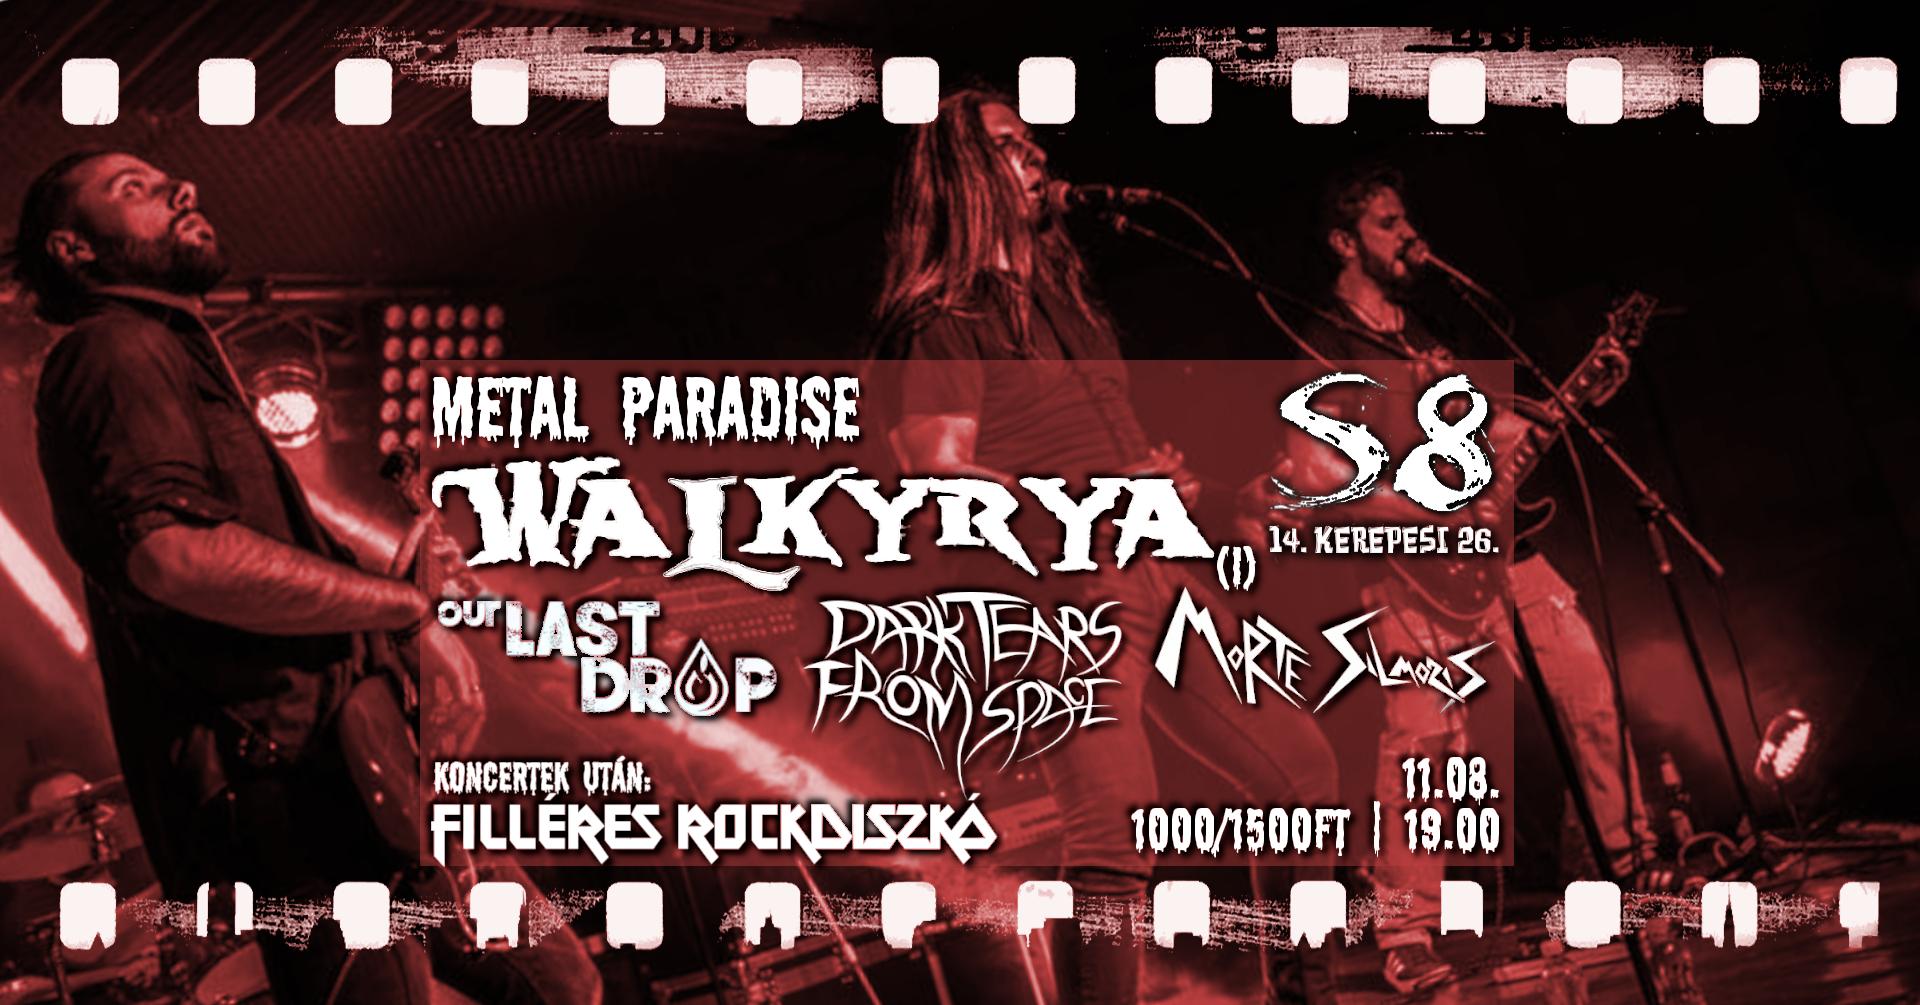 Metal Paradise - Walkyrya [I]